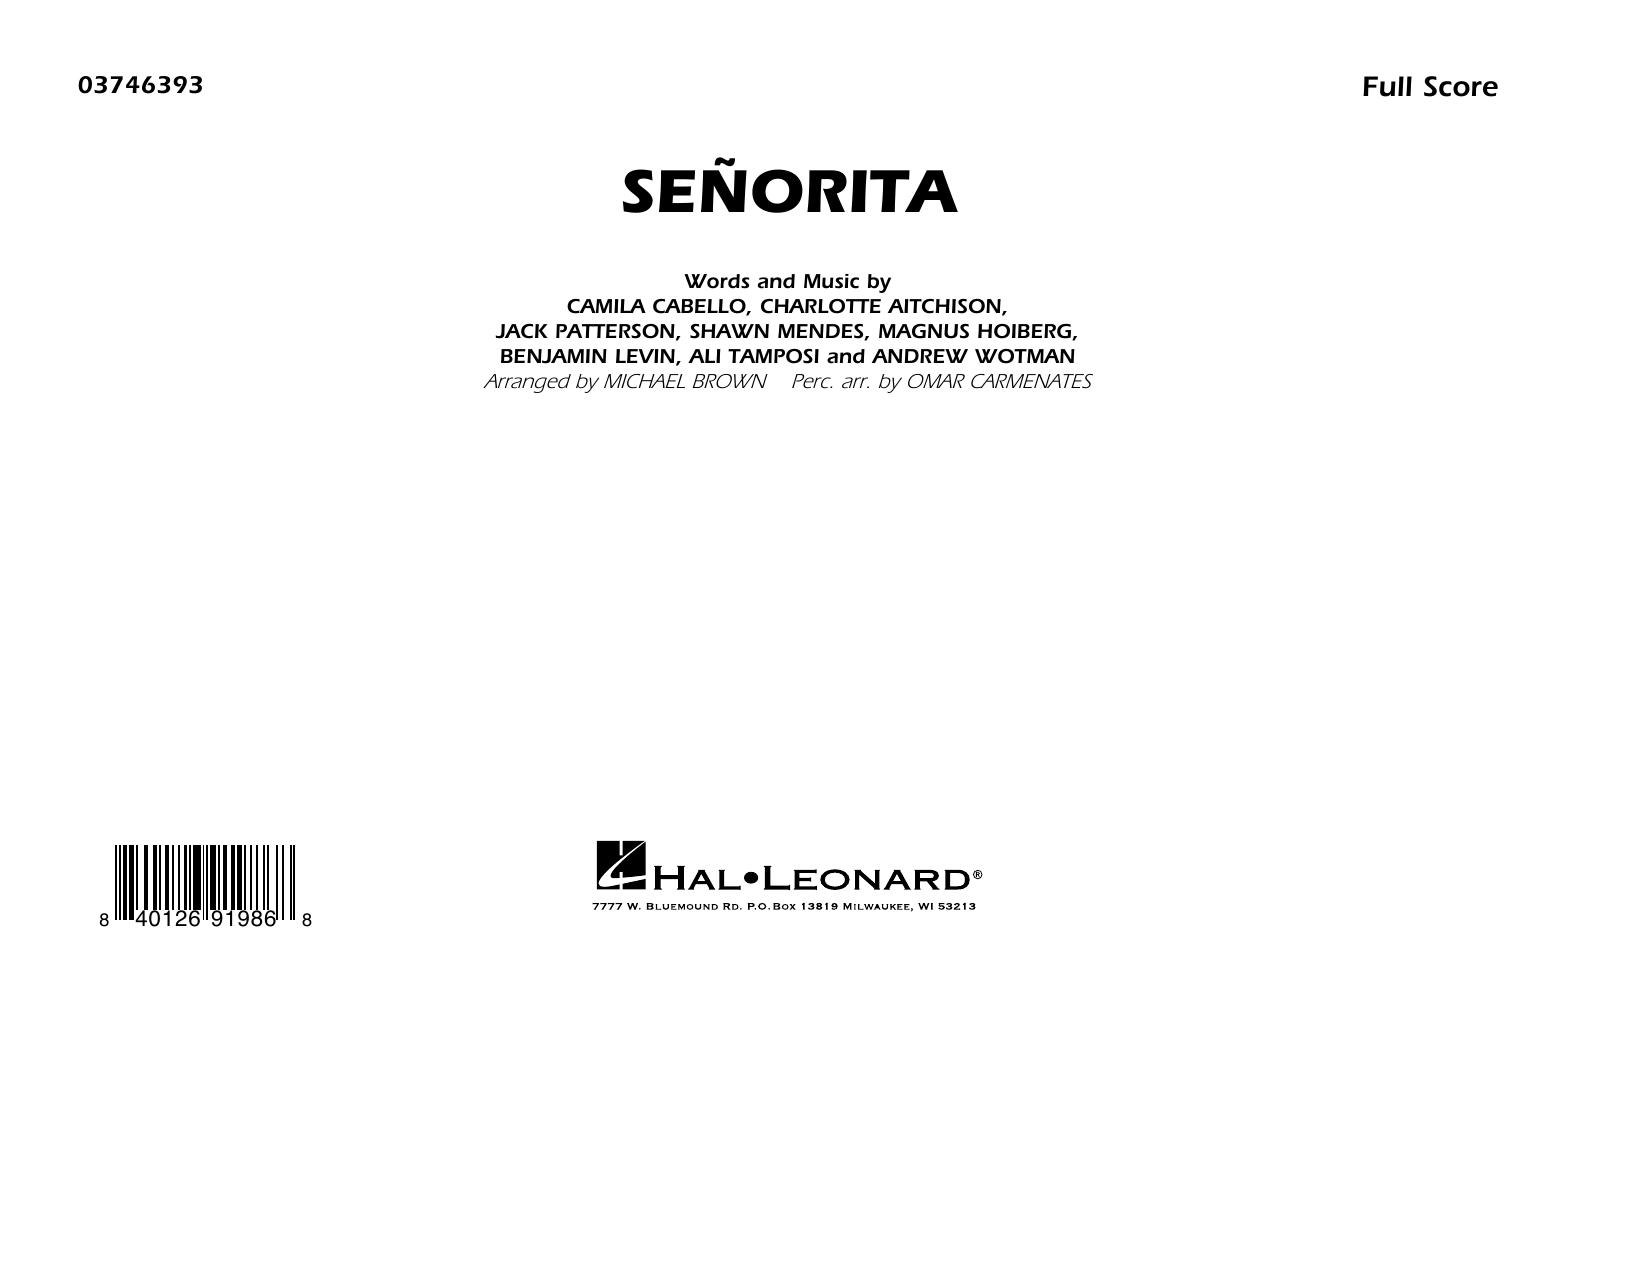 Señorita (arr. Carmenates and Brown) - Conductor Score (Full Score) (Marching Band)